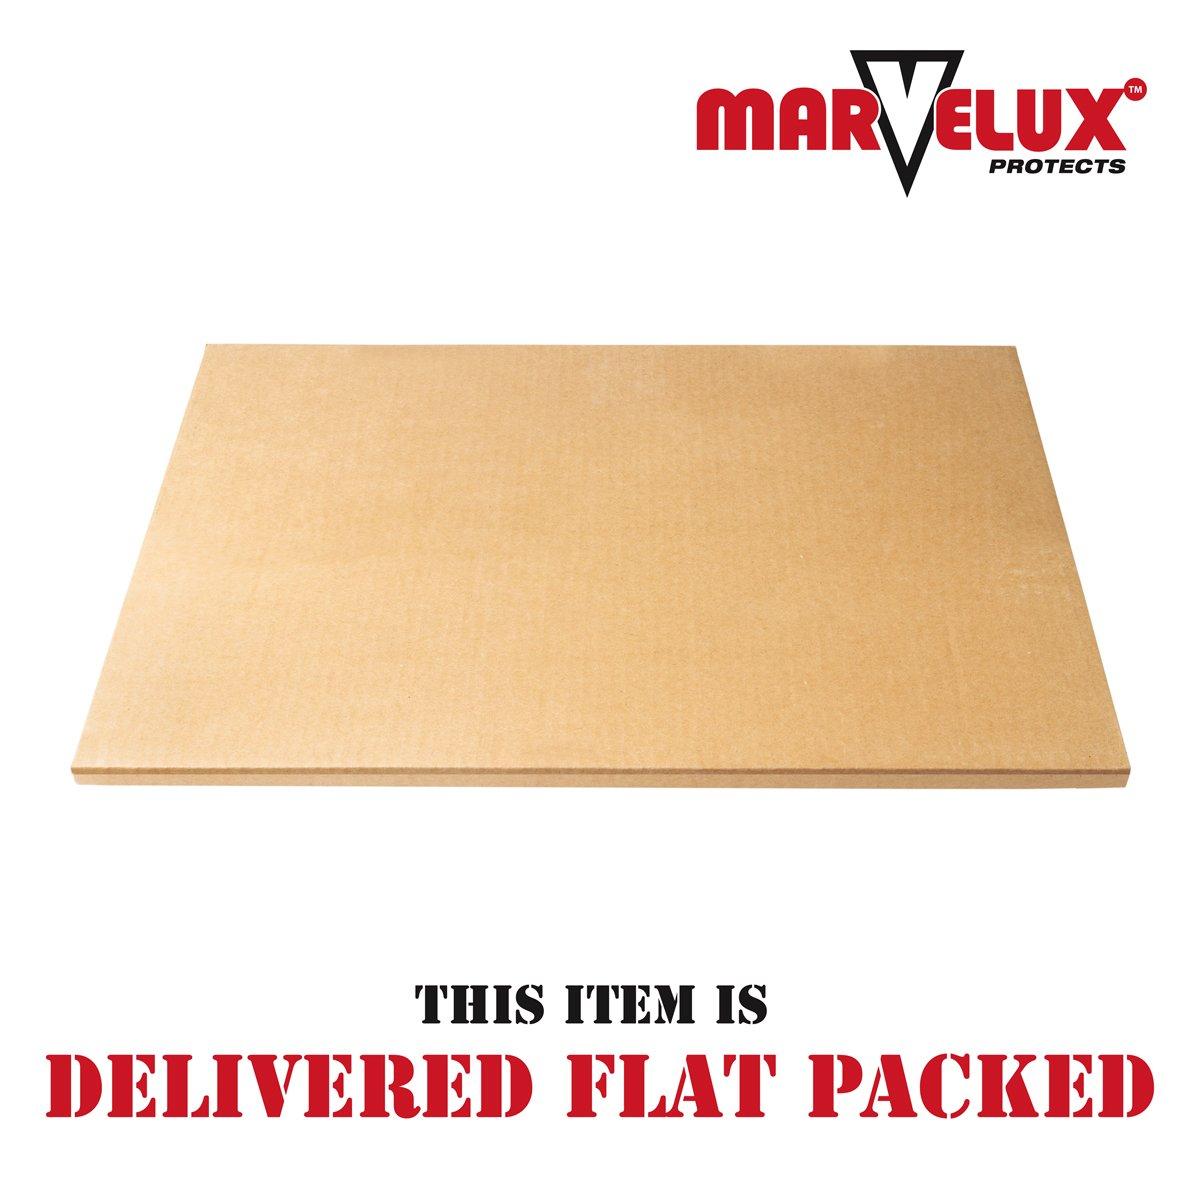 Lipped Chair Mat for Hard Floors Multiple Sizes Marvelux 36 x 48 ECO Transparent Hardwood Floor Protector Enhanced Polymer